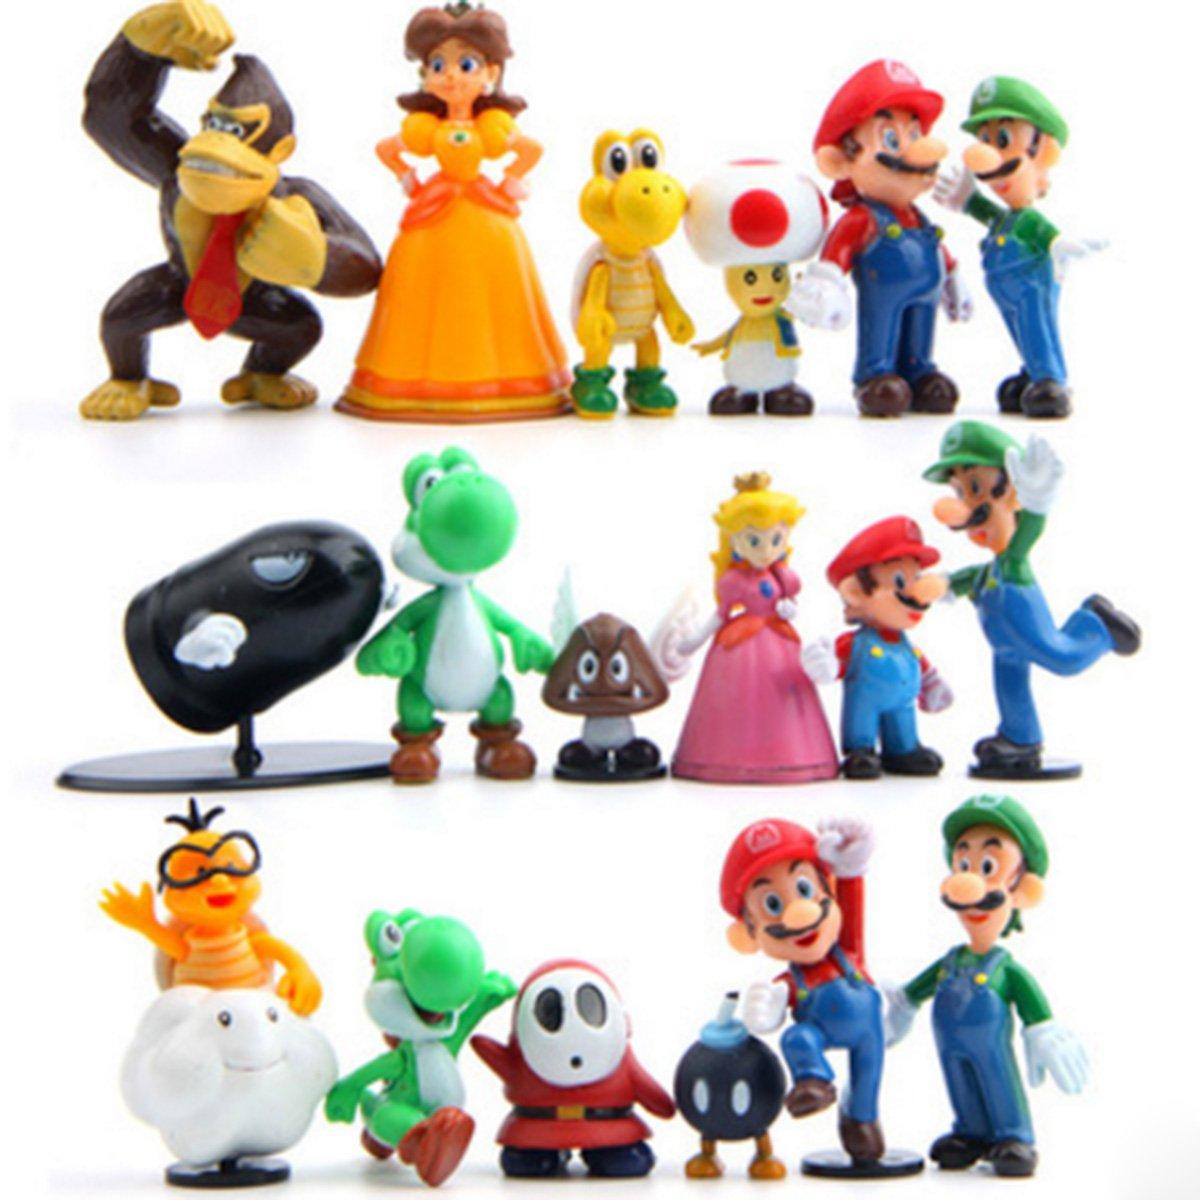 18 Piece Super Mario Bros Super Mary Princess, Turtle, Mushroom, Orangutan , Super Mary Action Figures, 2''